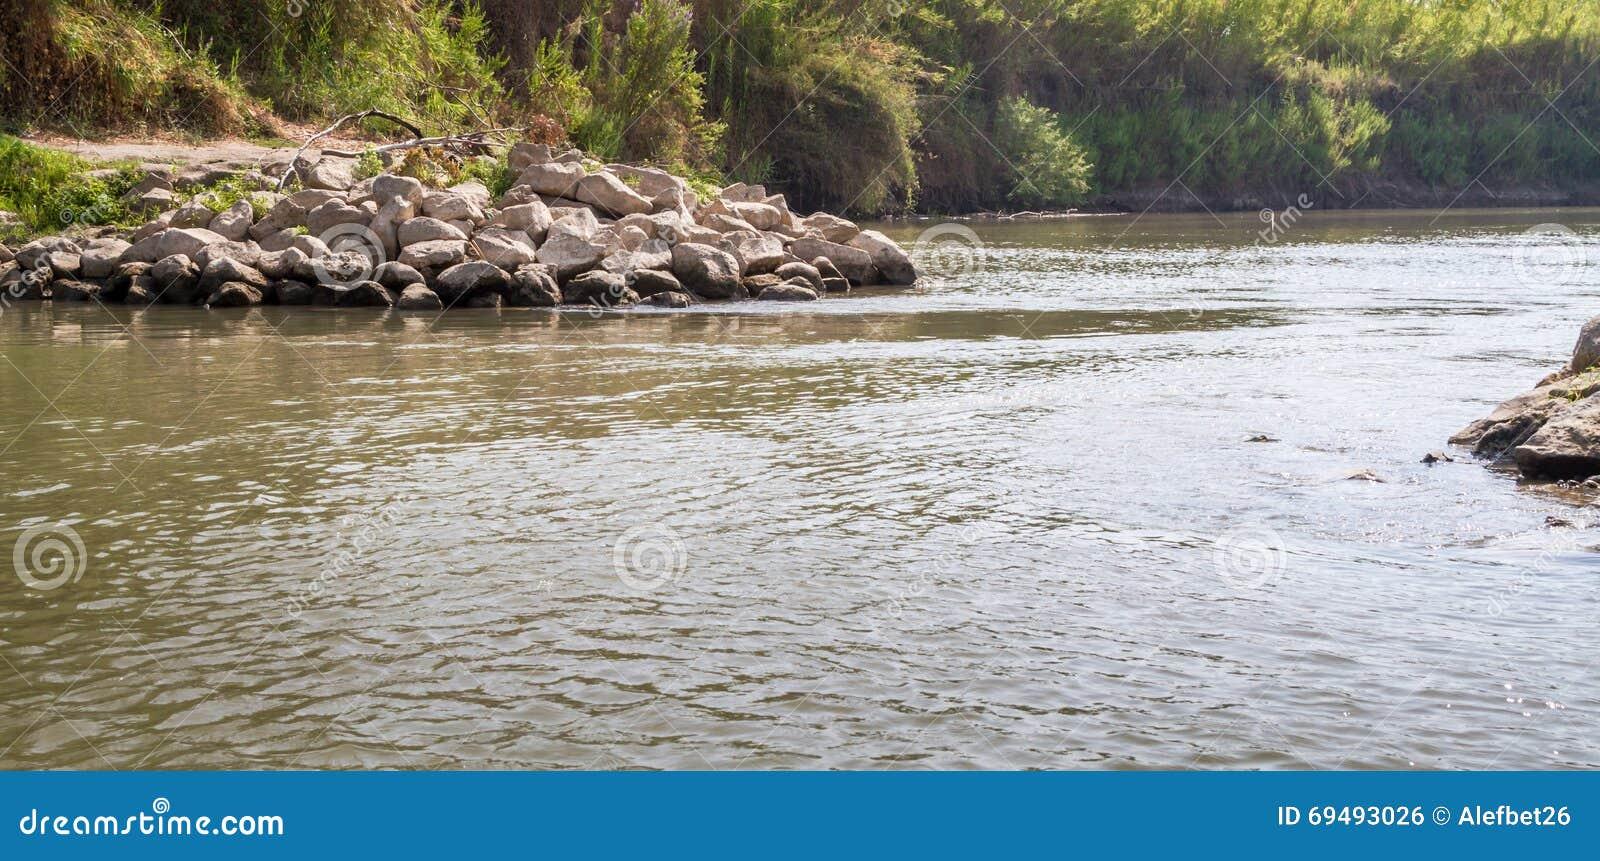 Buissons le long des banques, Jordan River